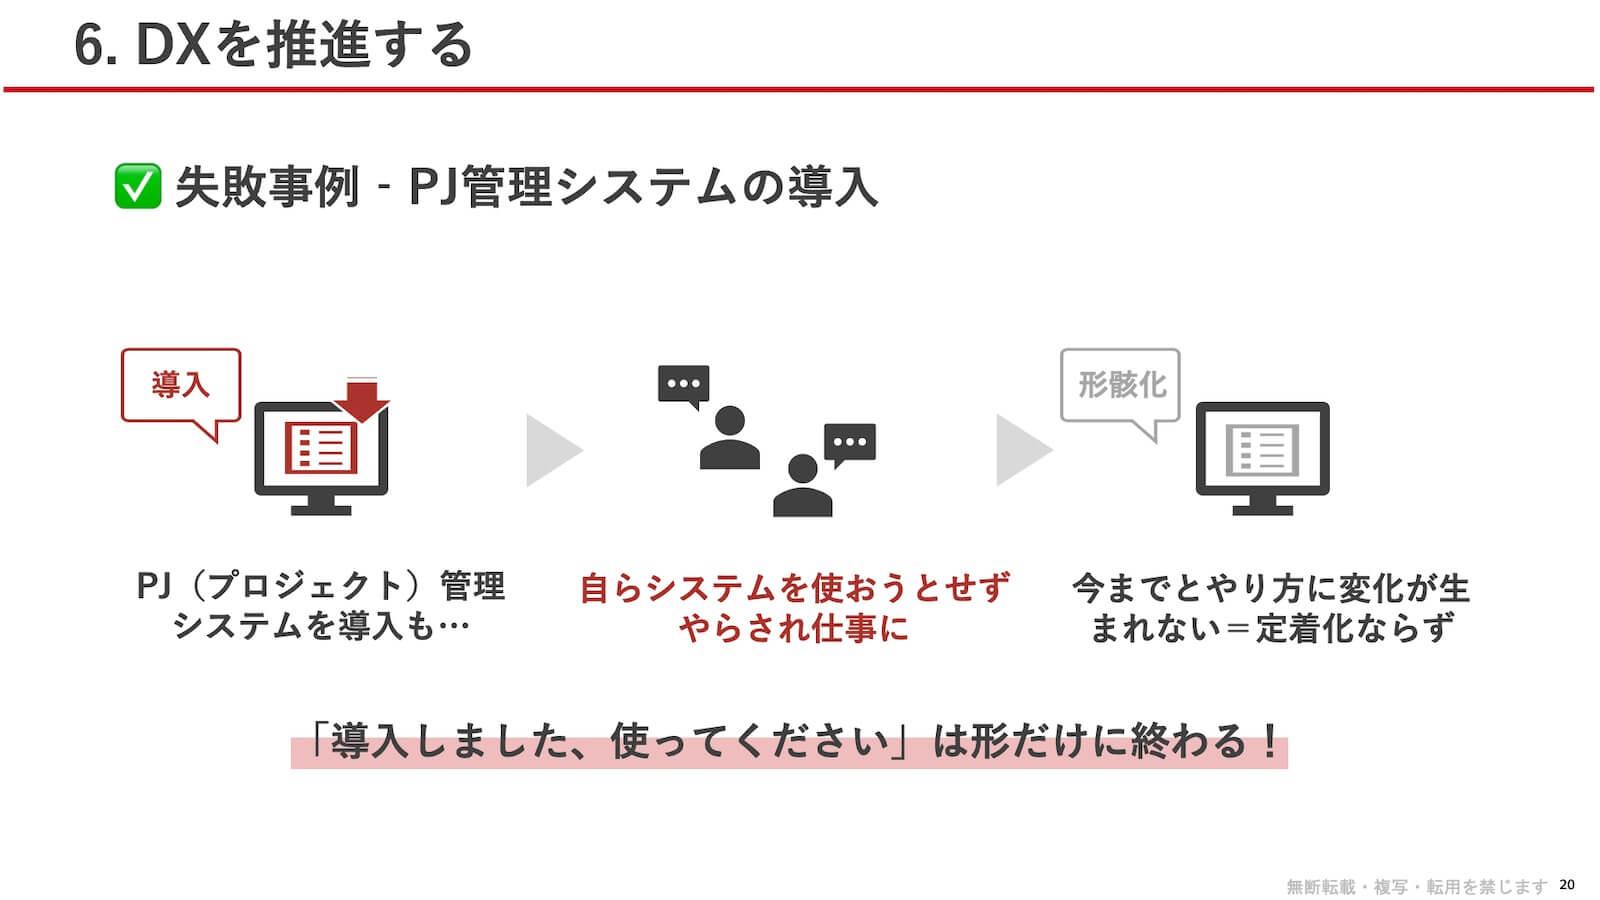 plazma13-case-study-biccamera-mia-7